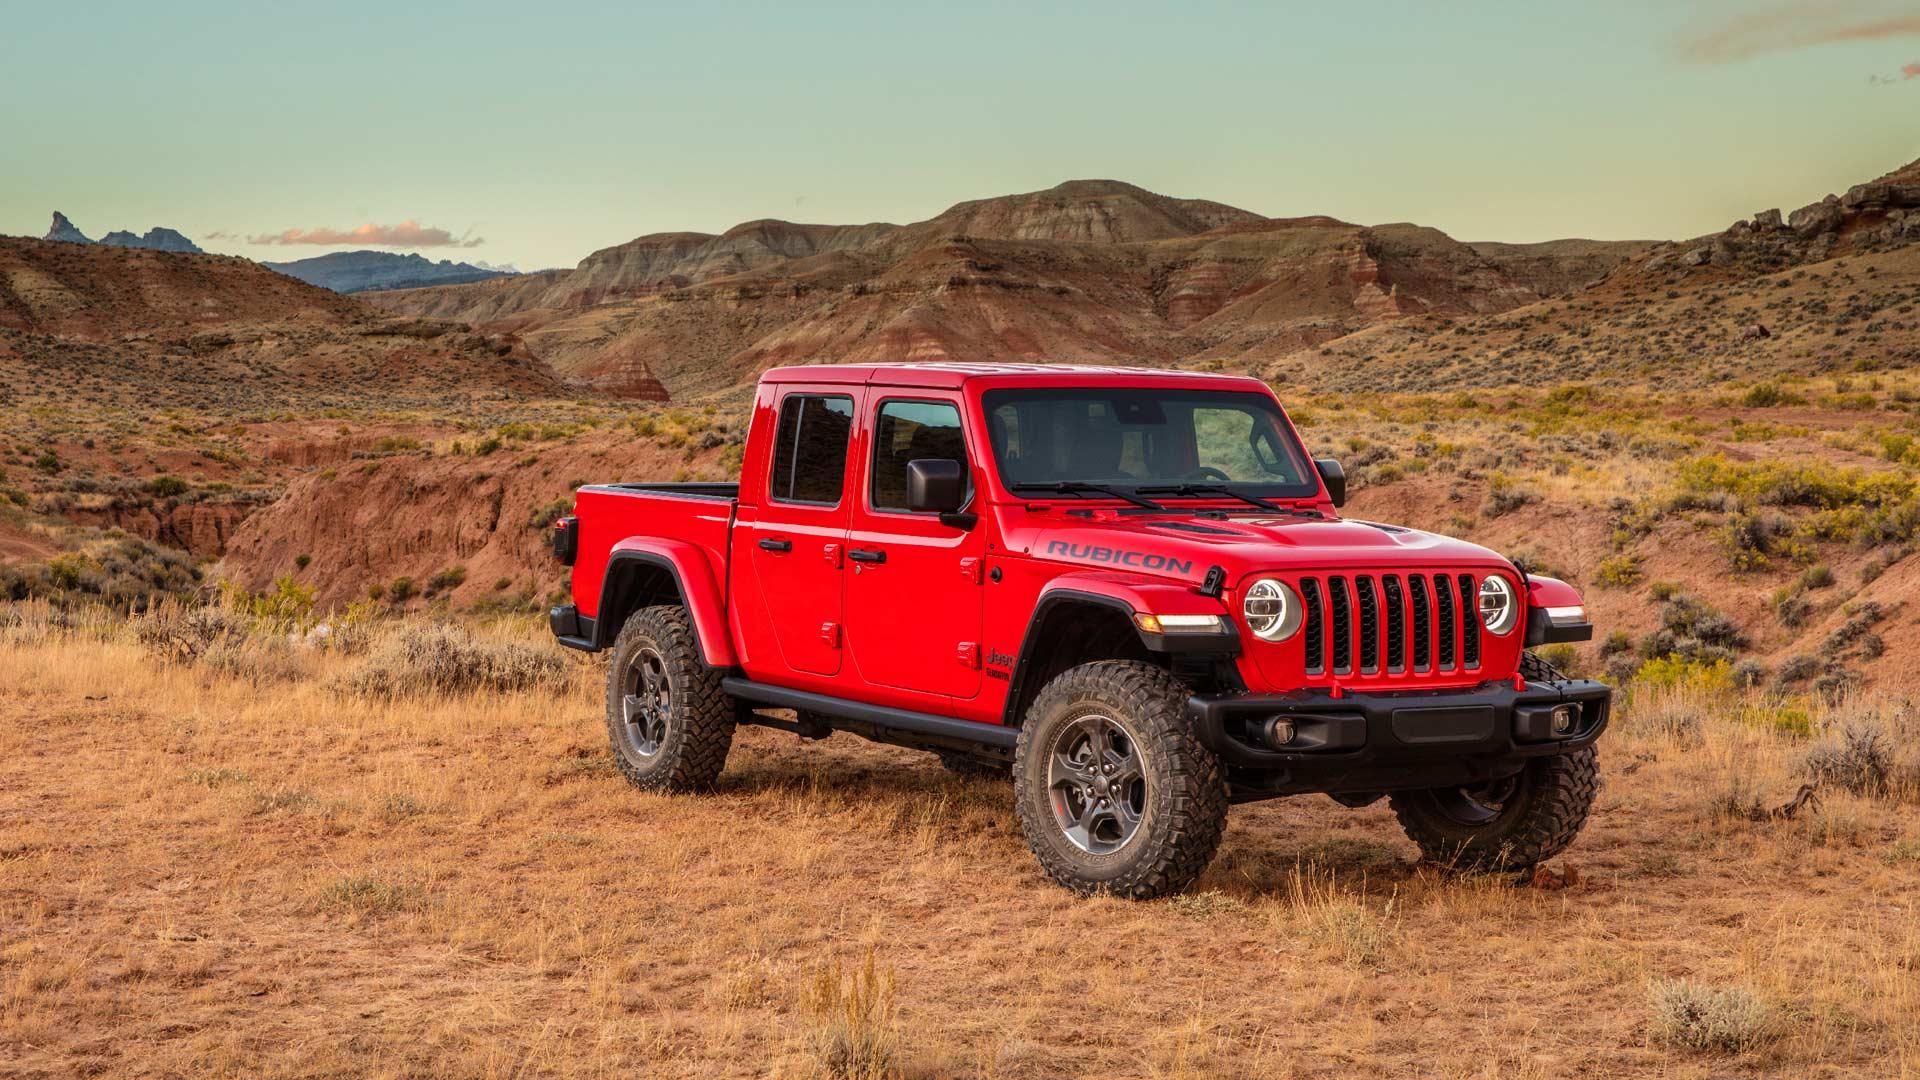 Gallery: 2020 Jeep Gladiator - Autodevot